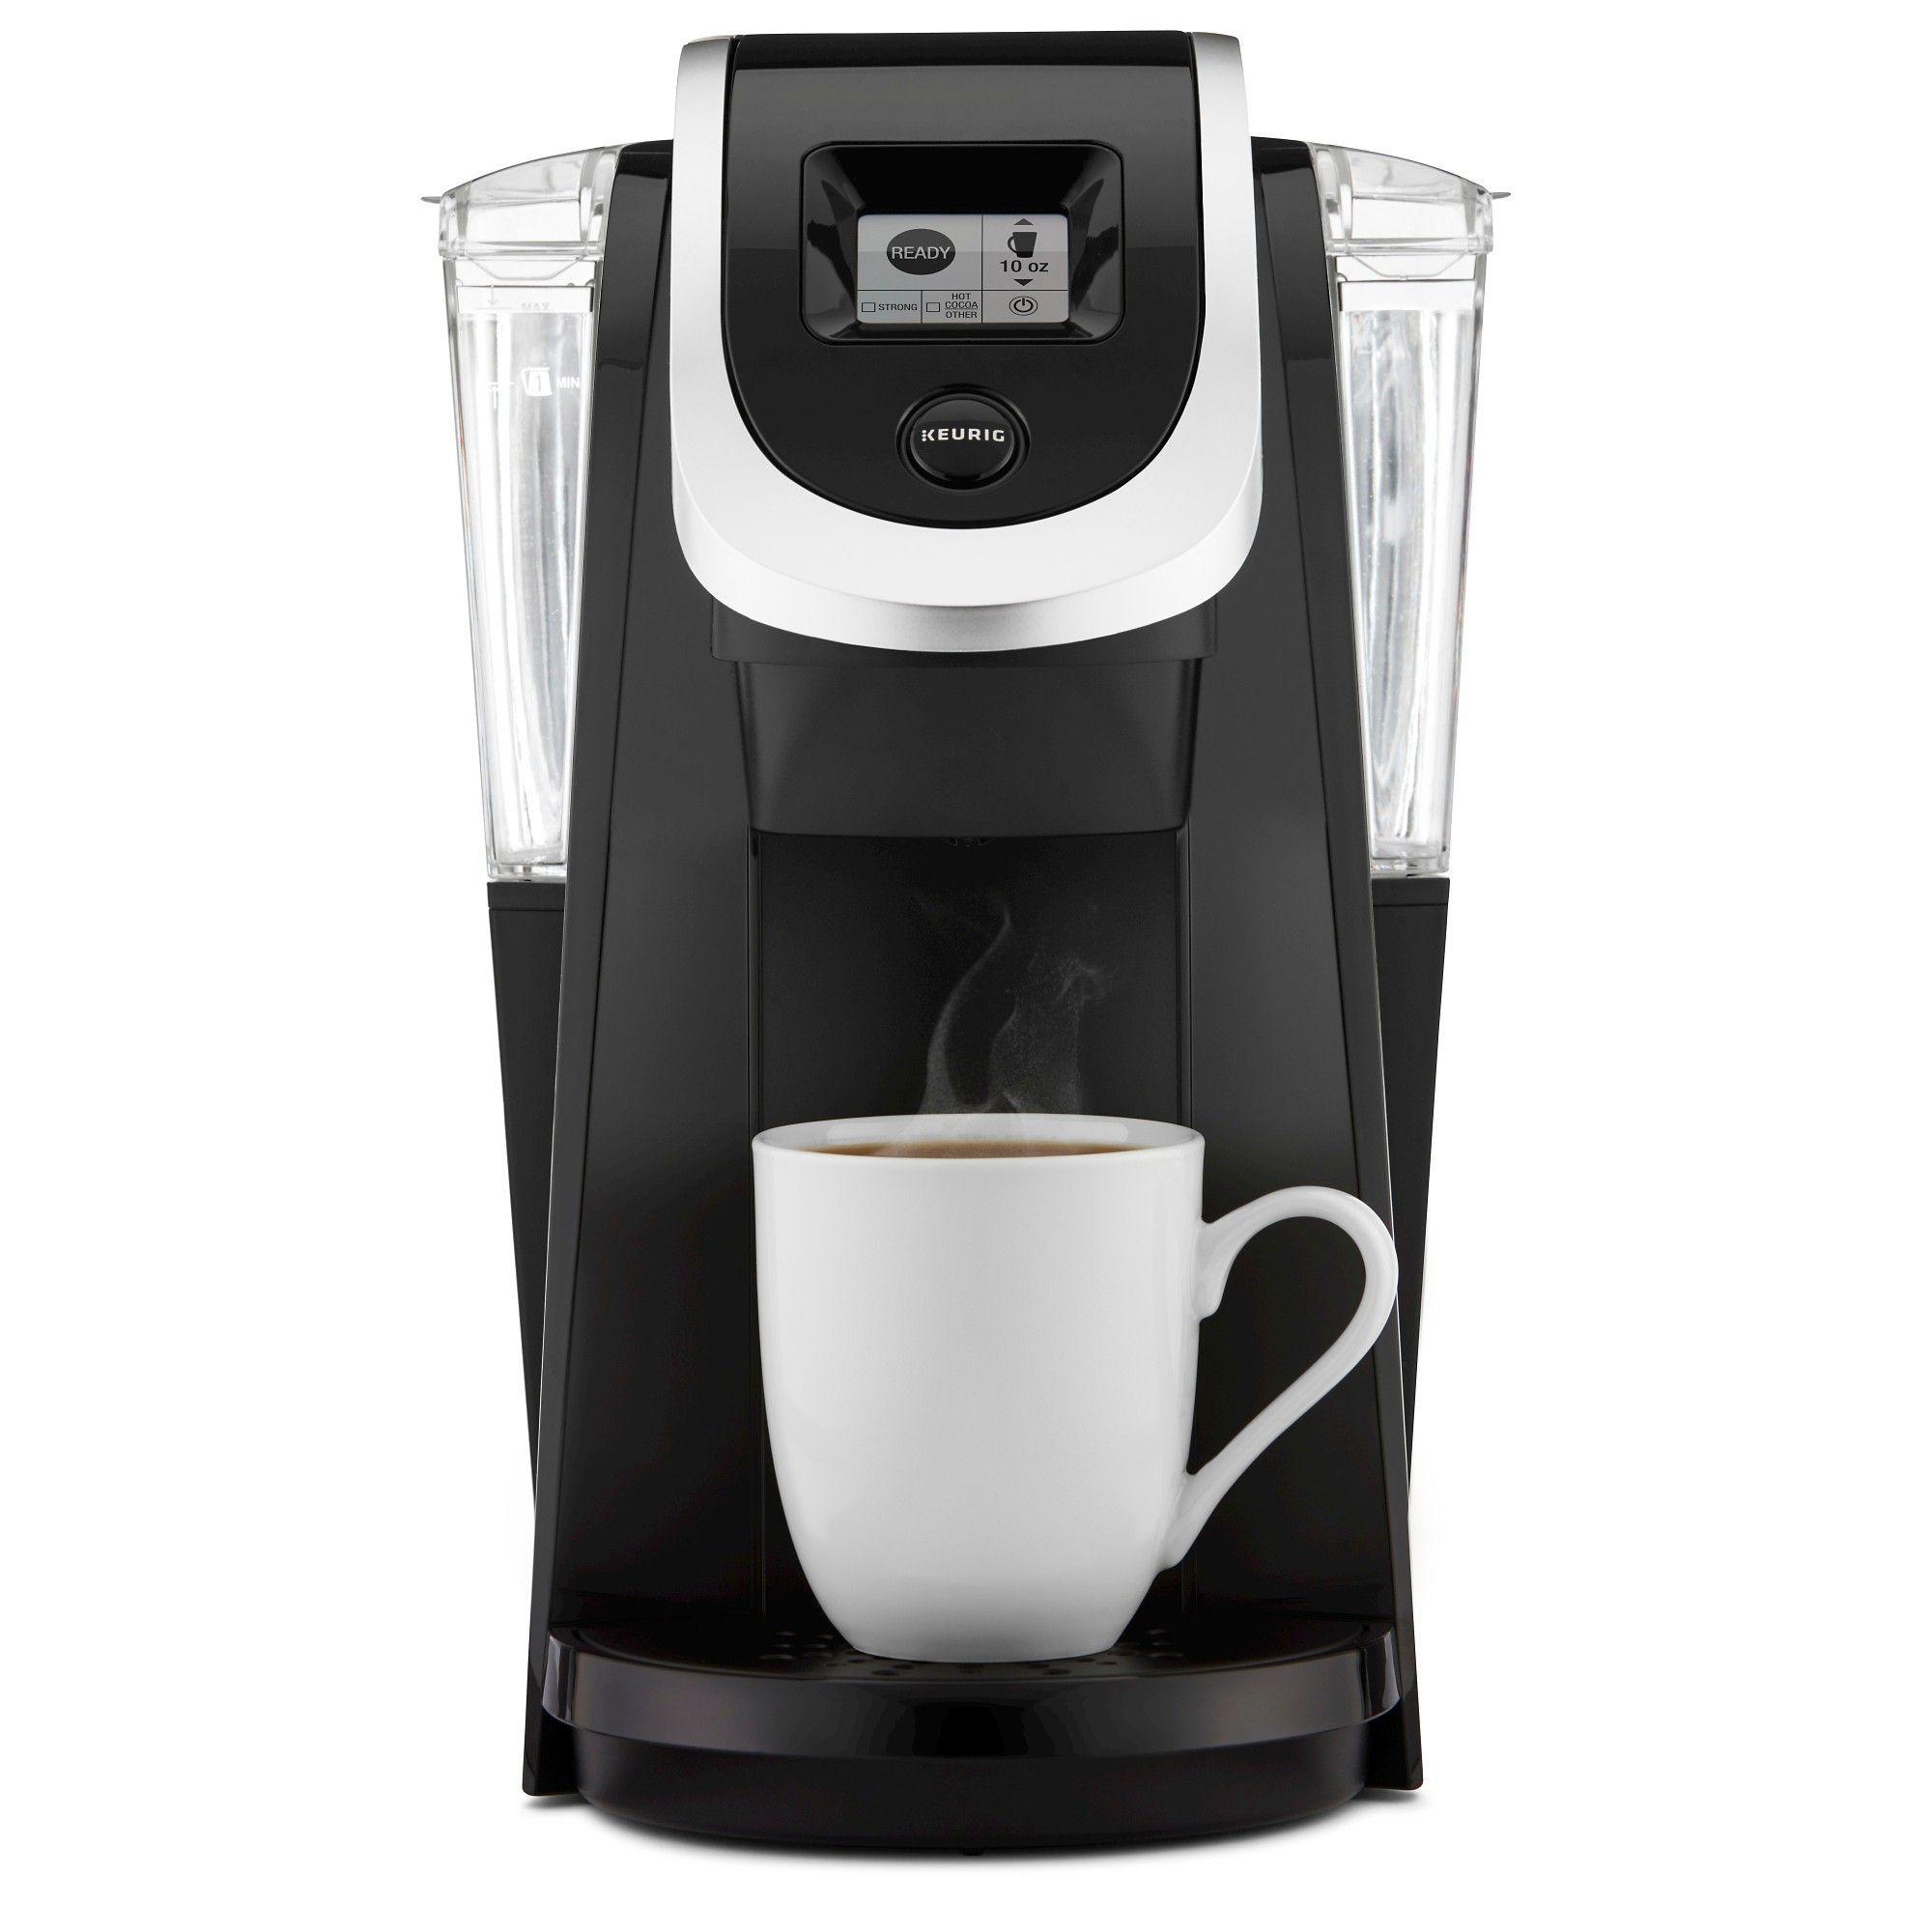 Keurig K200 Coffee Maker Black Products Coffee Pod Coffee